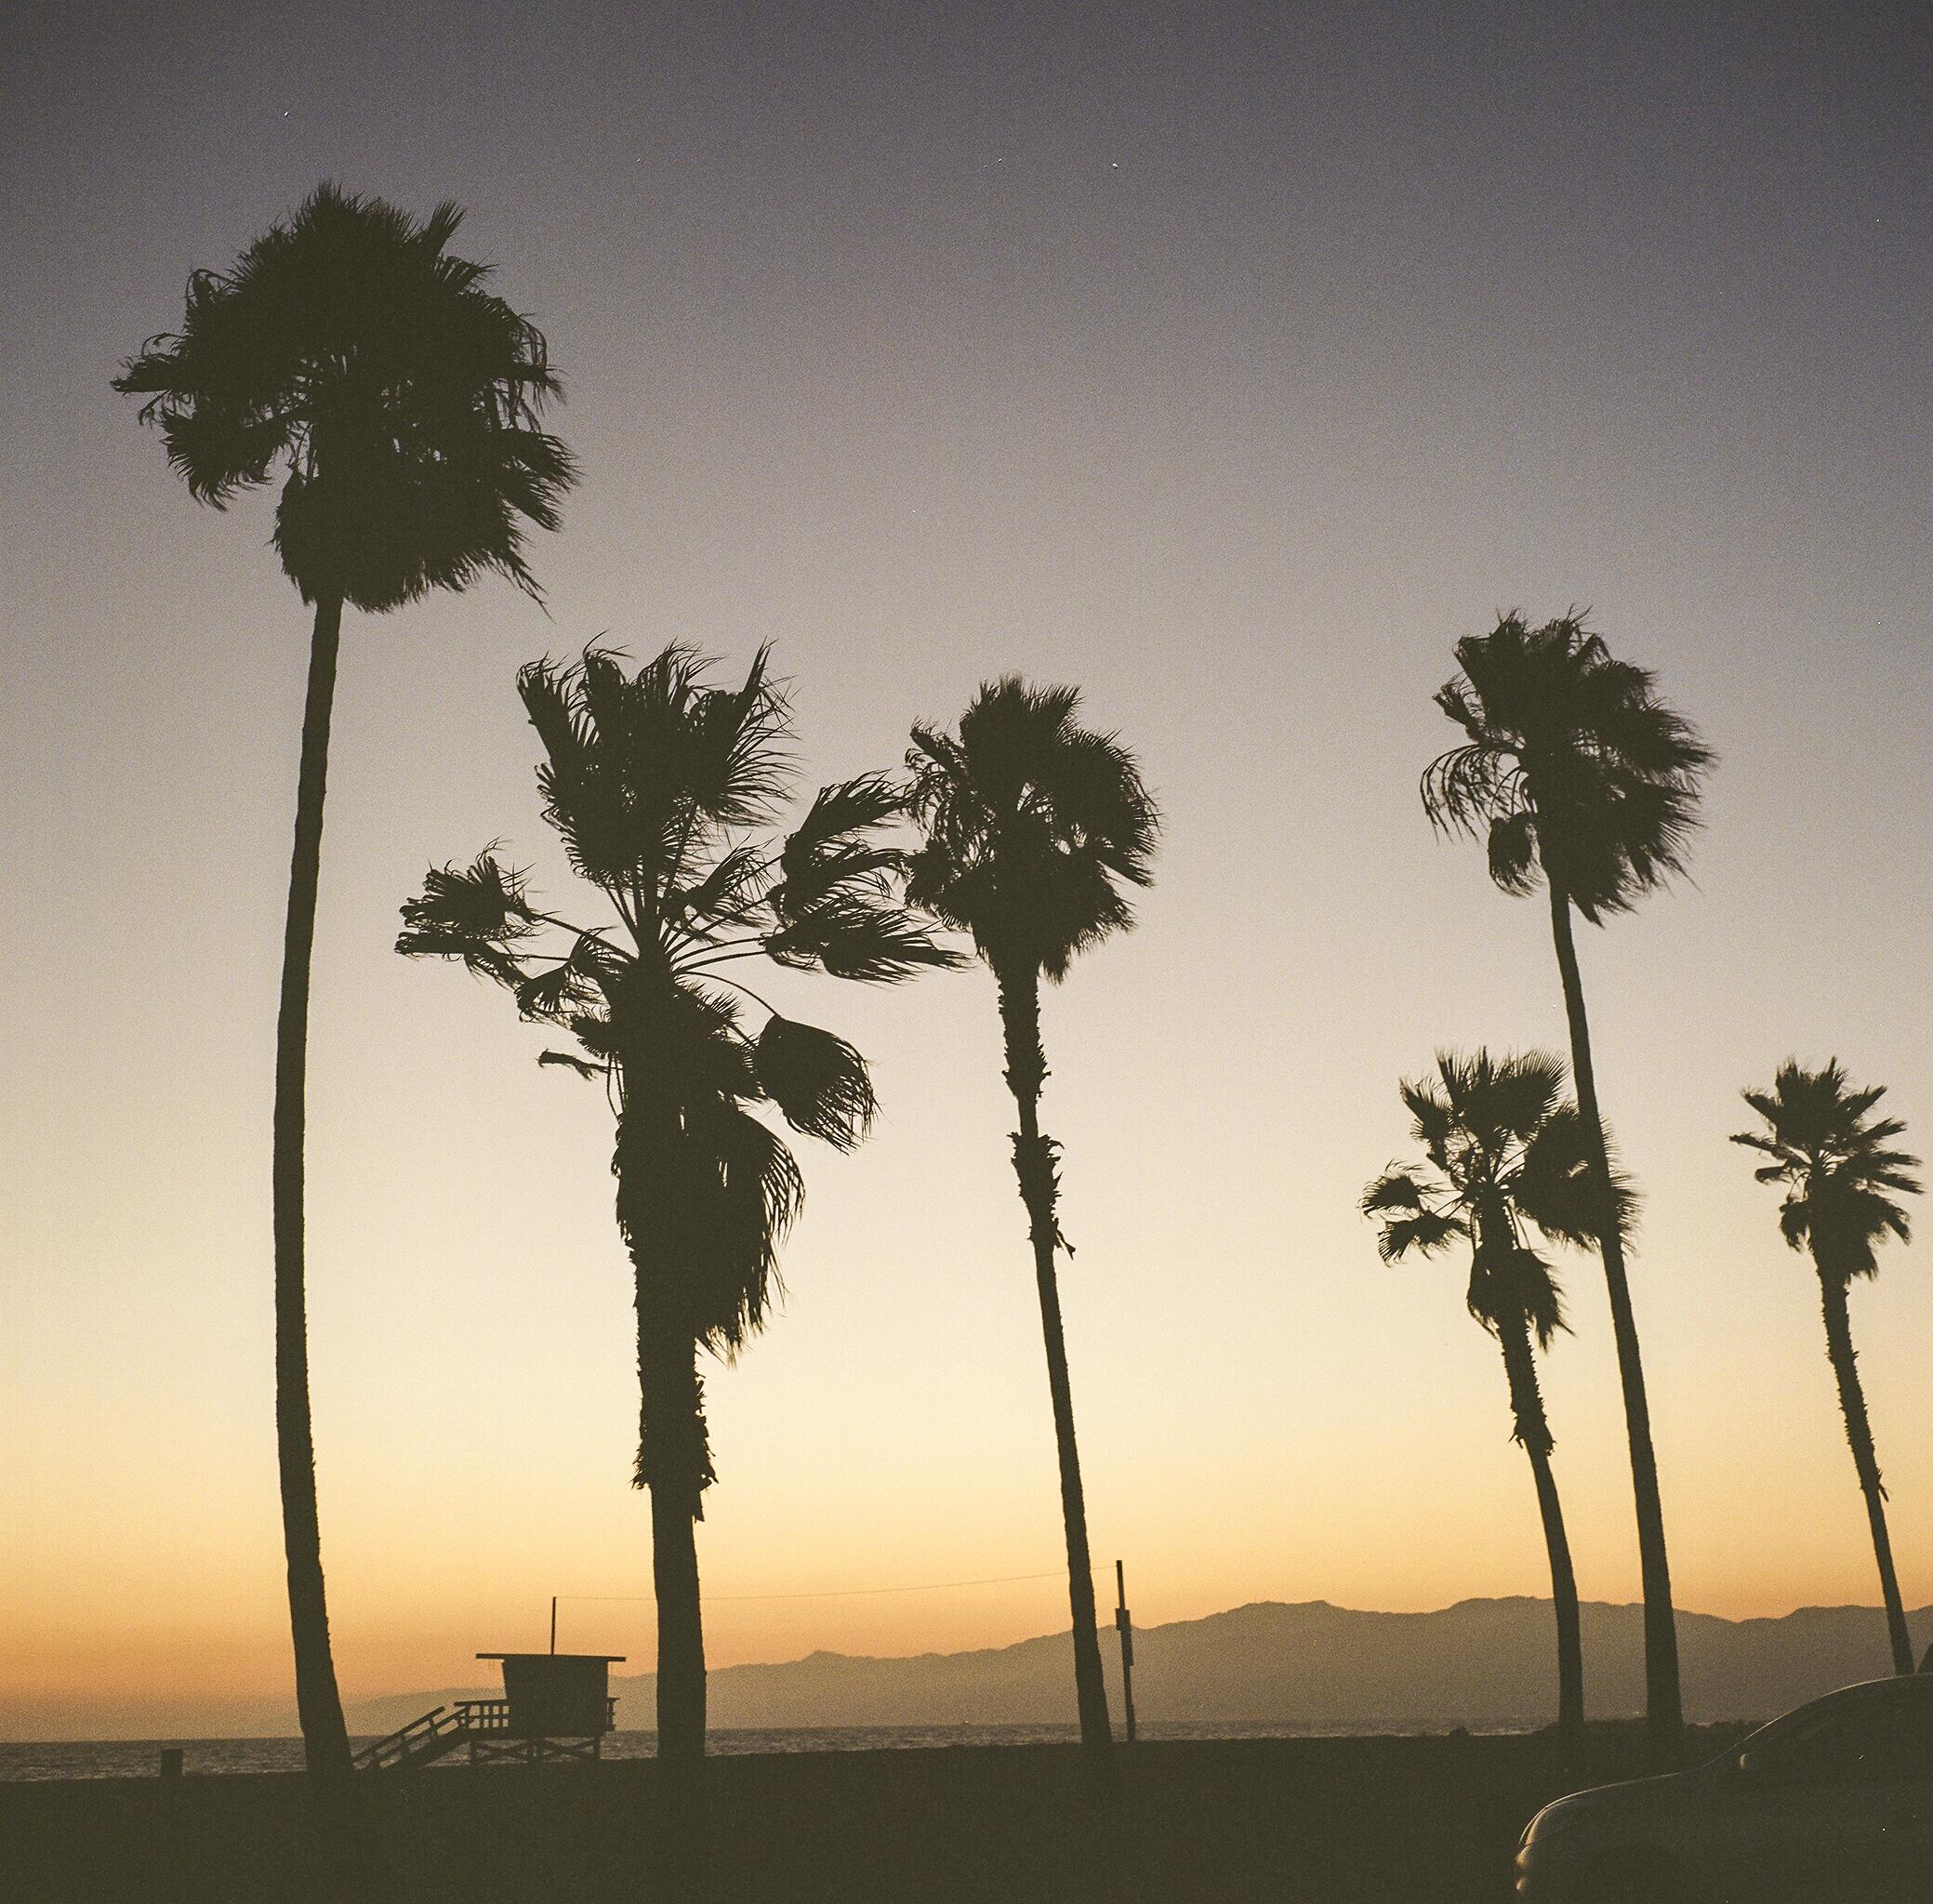 Venice Beach | Rolleiflex 3.5 Planar | Portra 400 | Tony Klimas